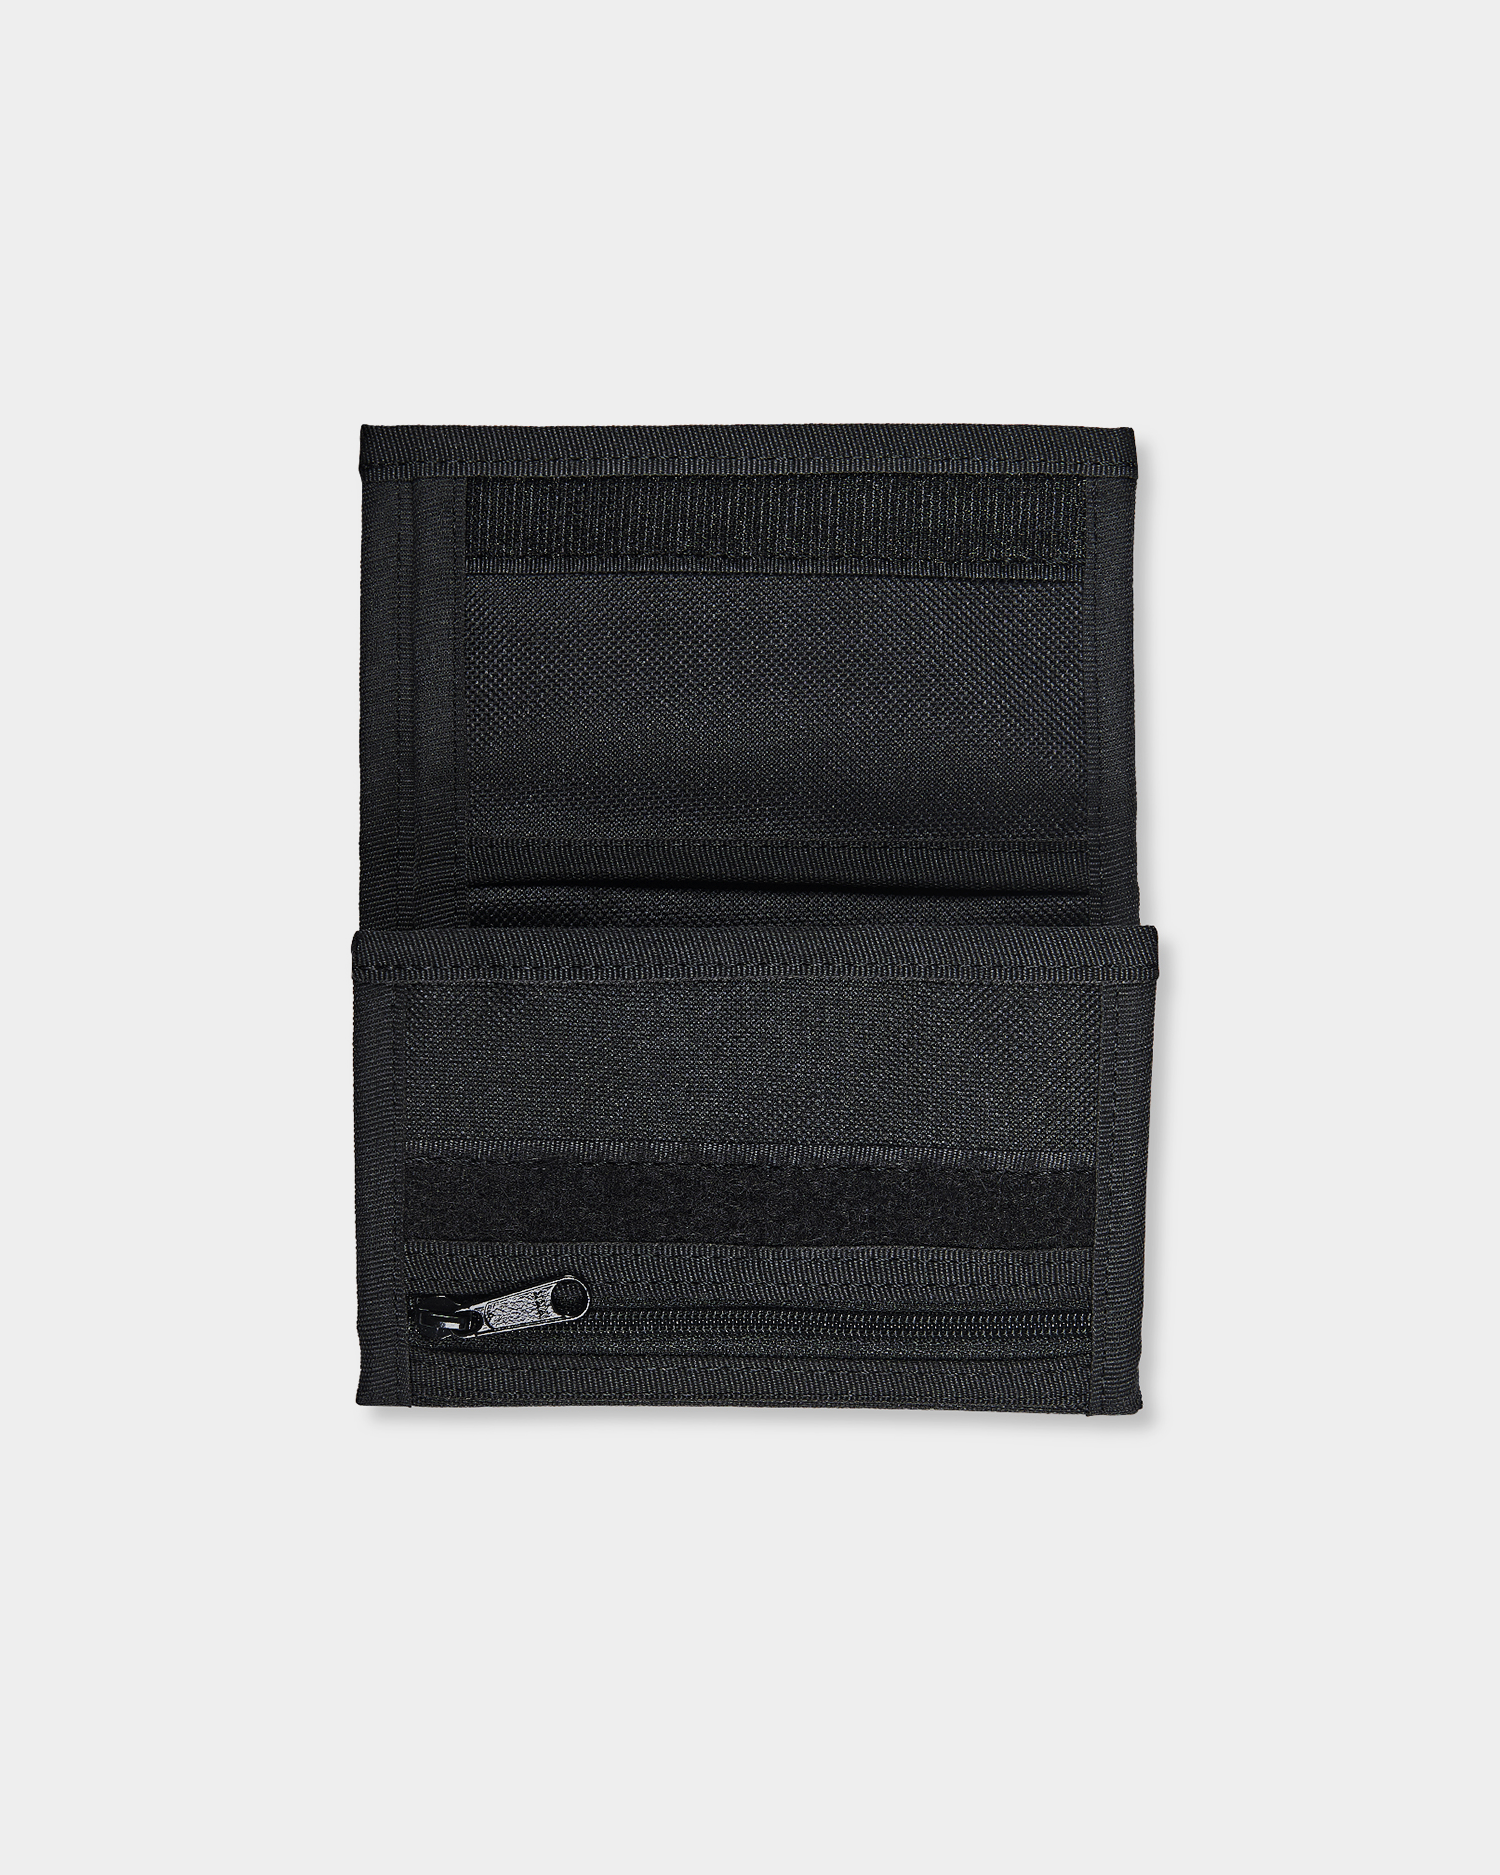 Polar Skate Dude Key Wallet Black